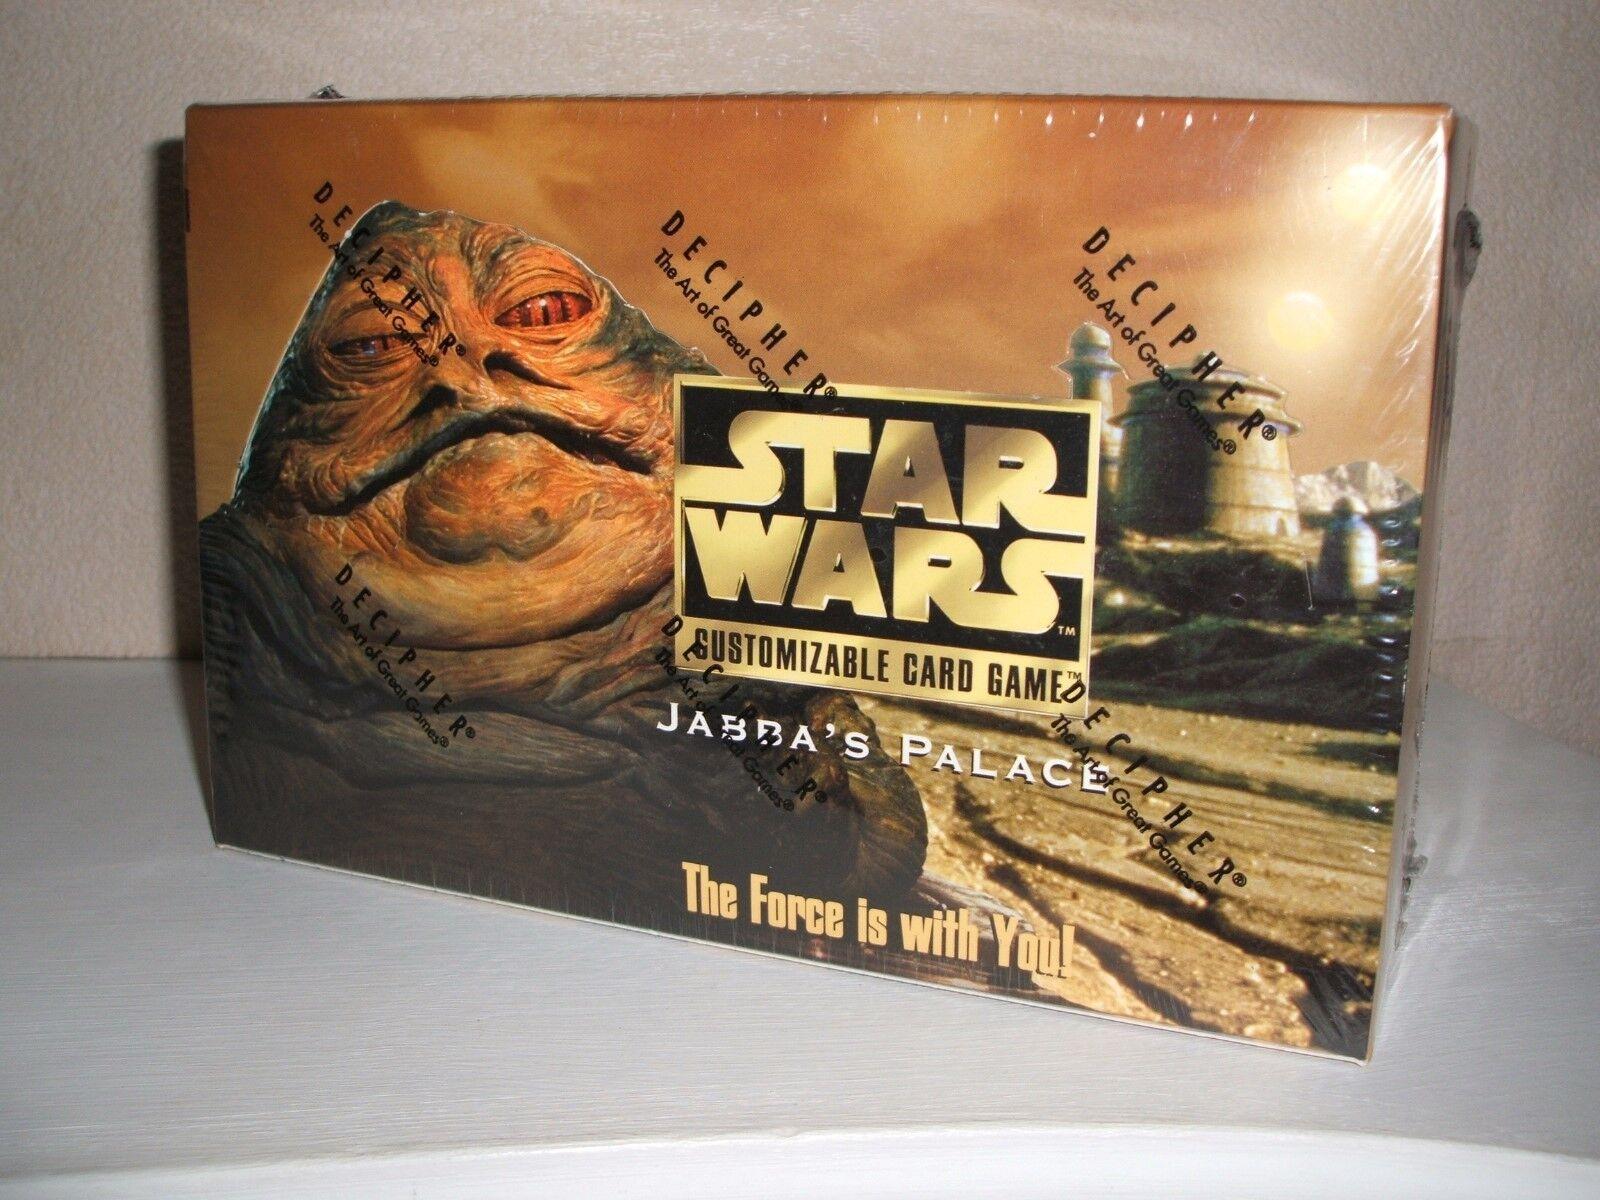 DECIPHER STAR WARS JABBA'S PALACE LTD EDITION EXPANSION SET FACTORY SEALED BOX